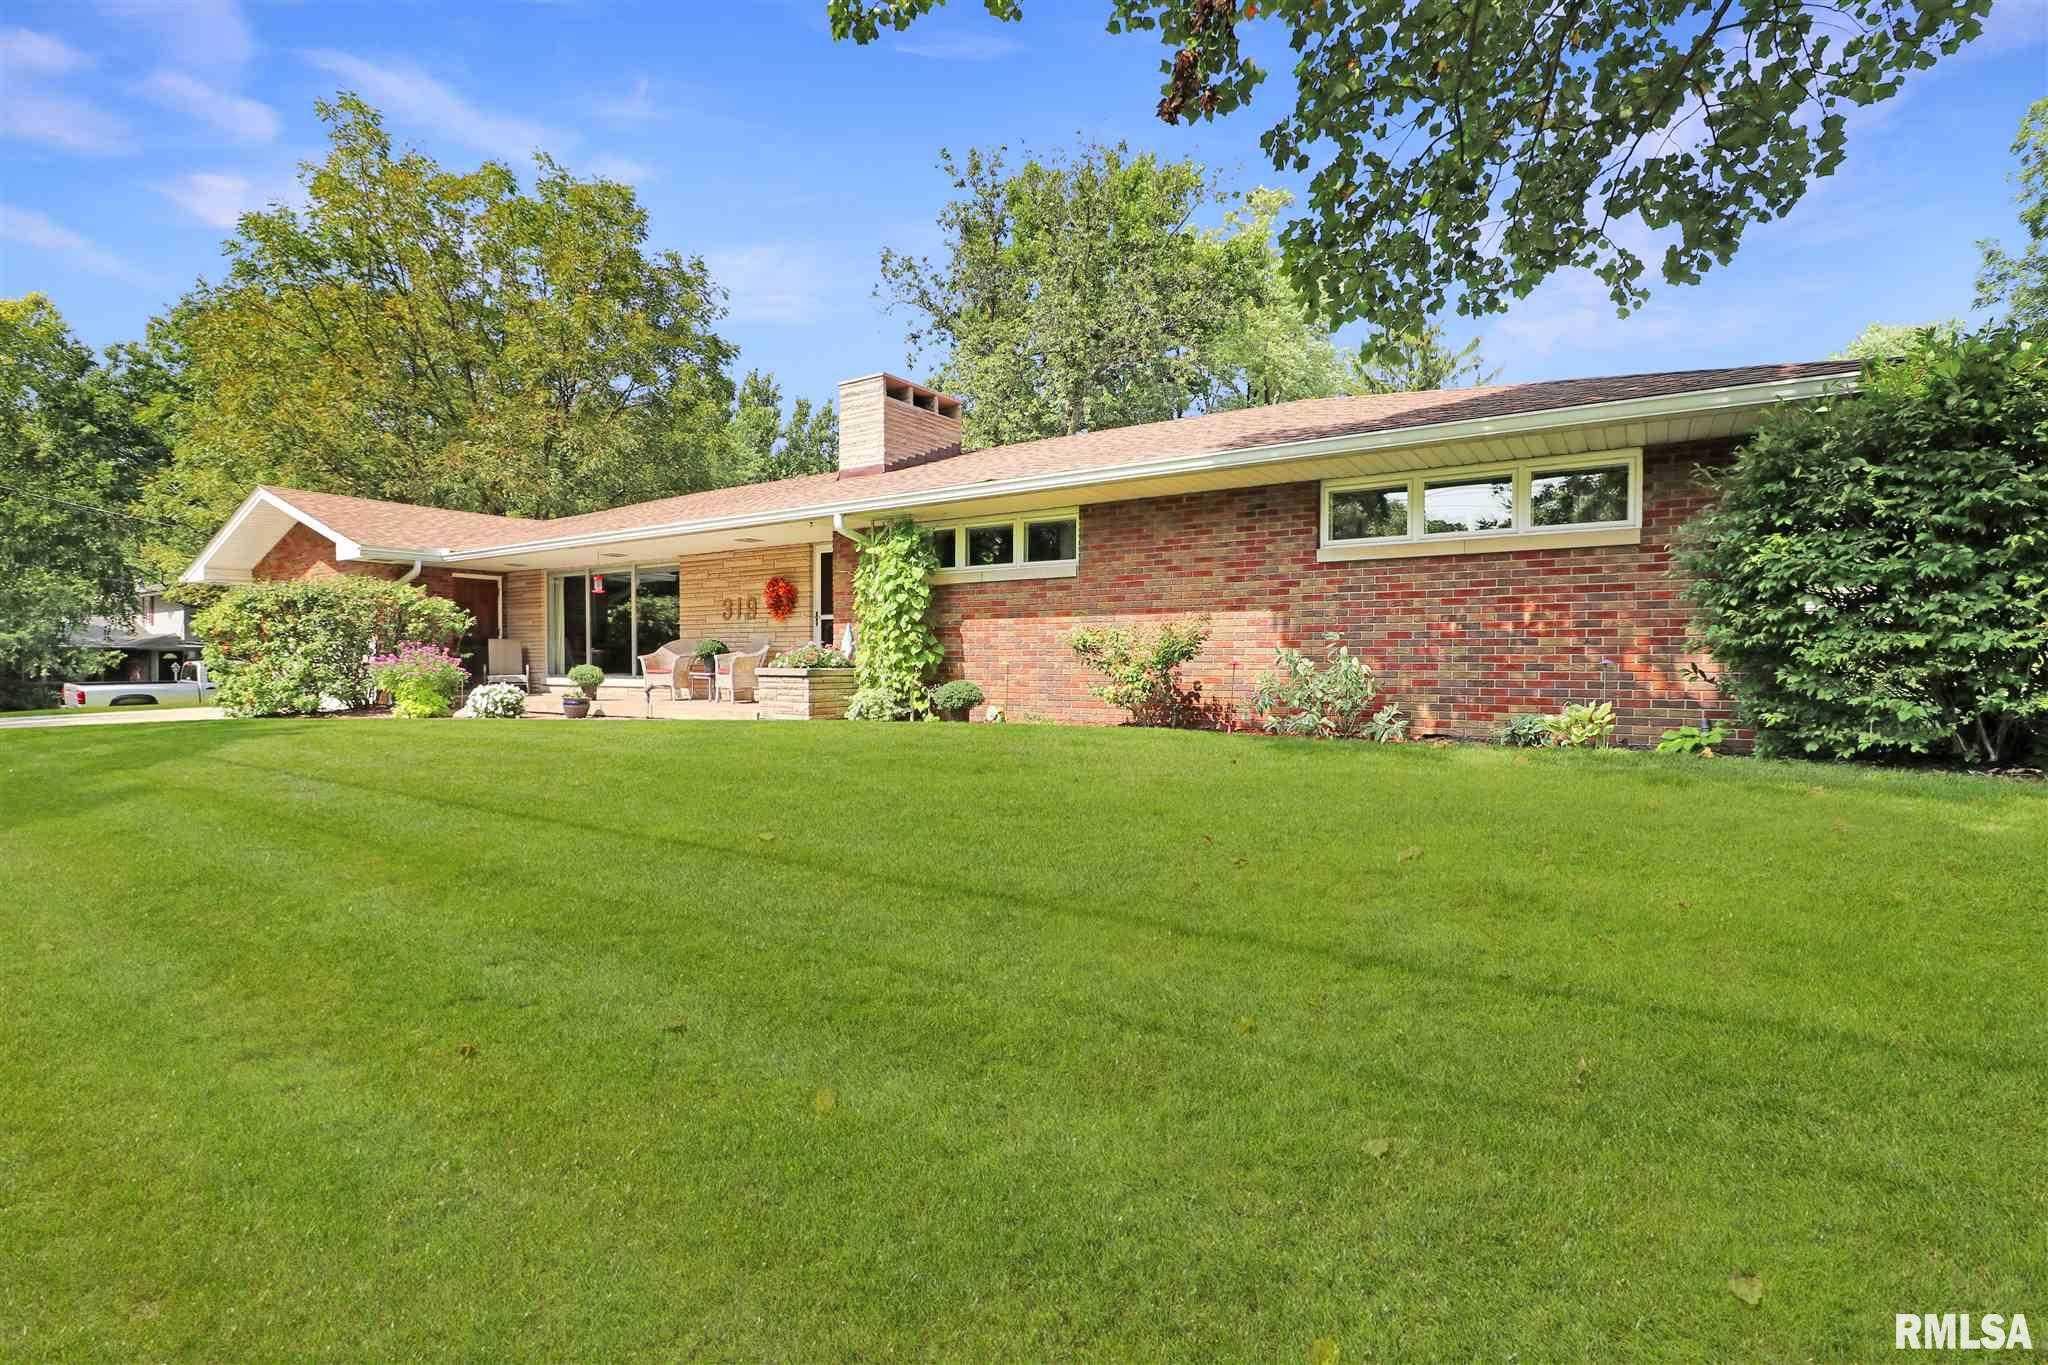 $169,900 - 4Br/3Ba -  for Sale in Ellis, Peoria